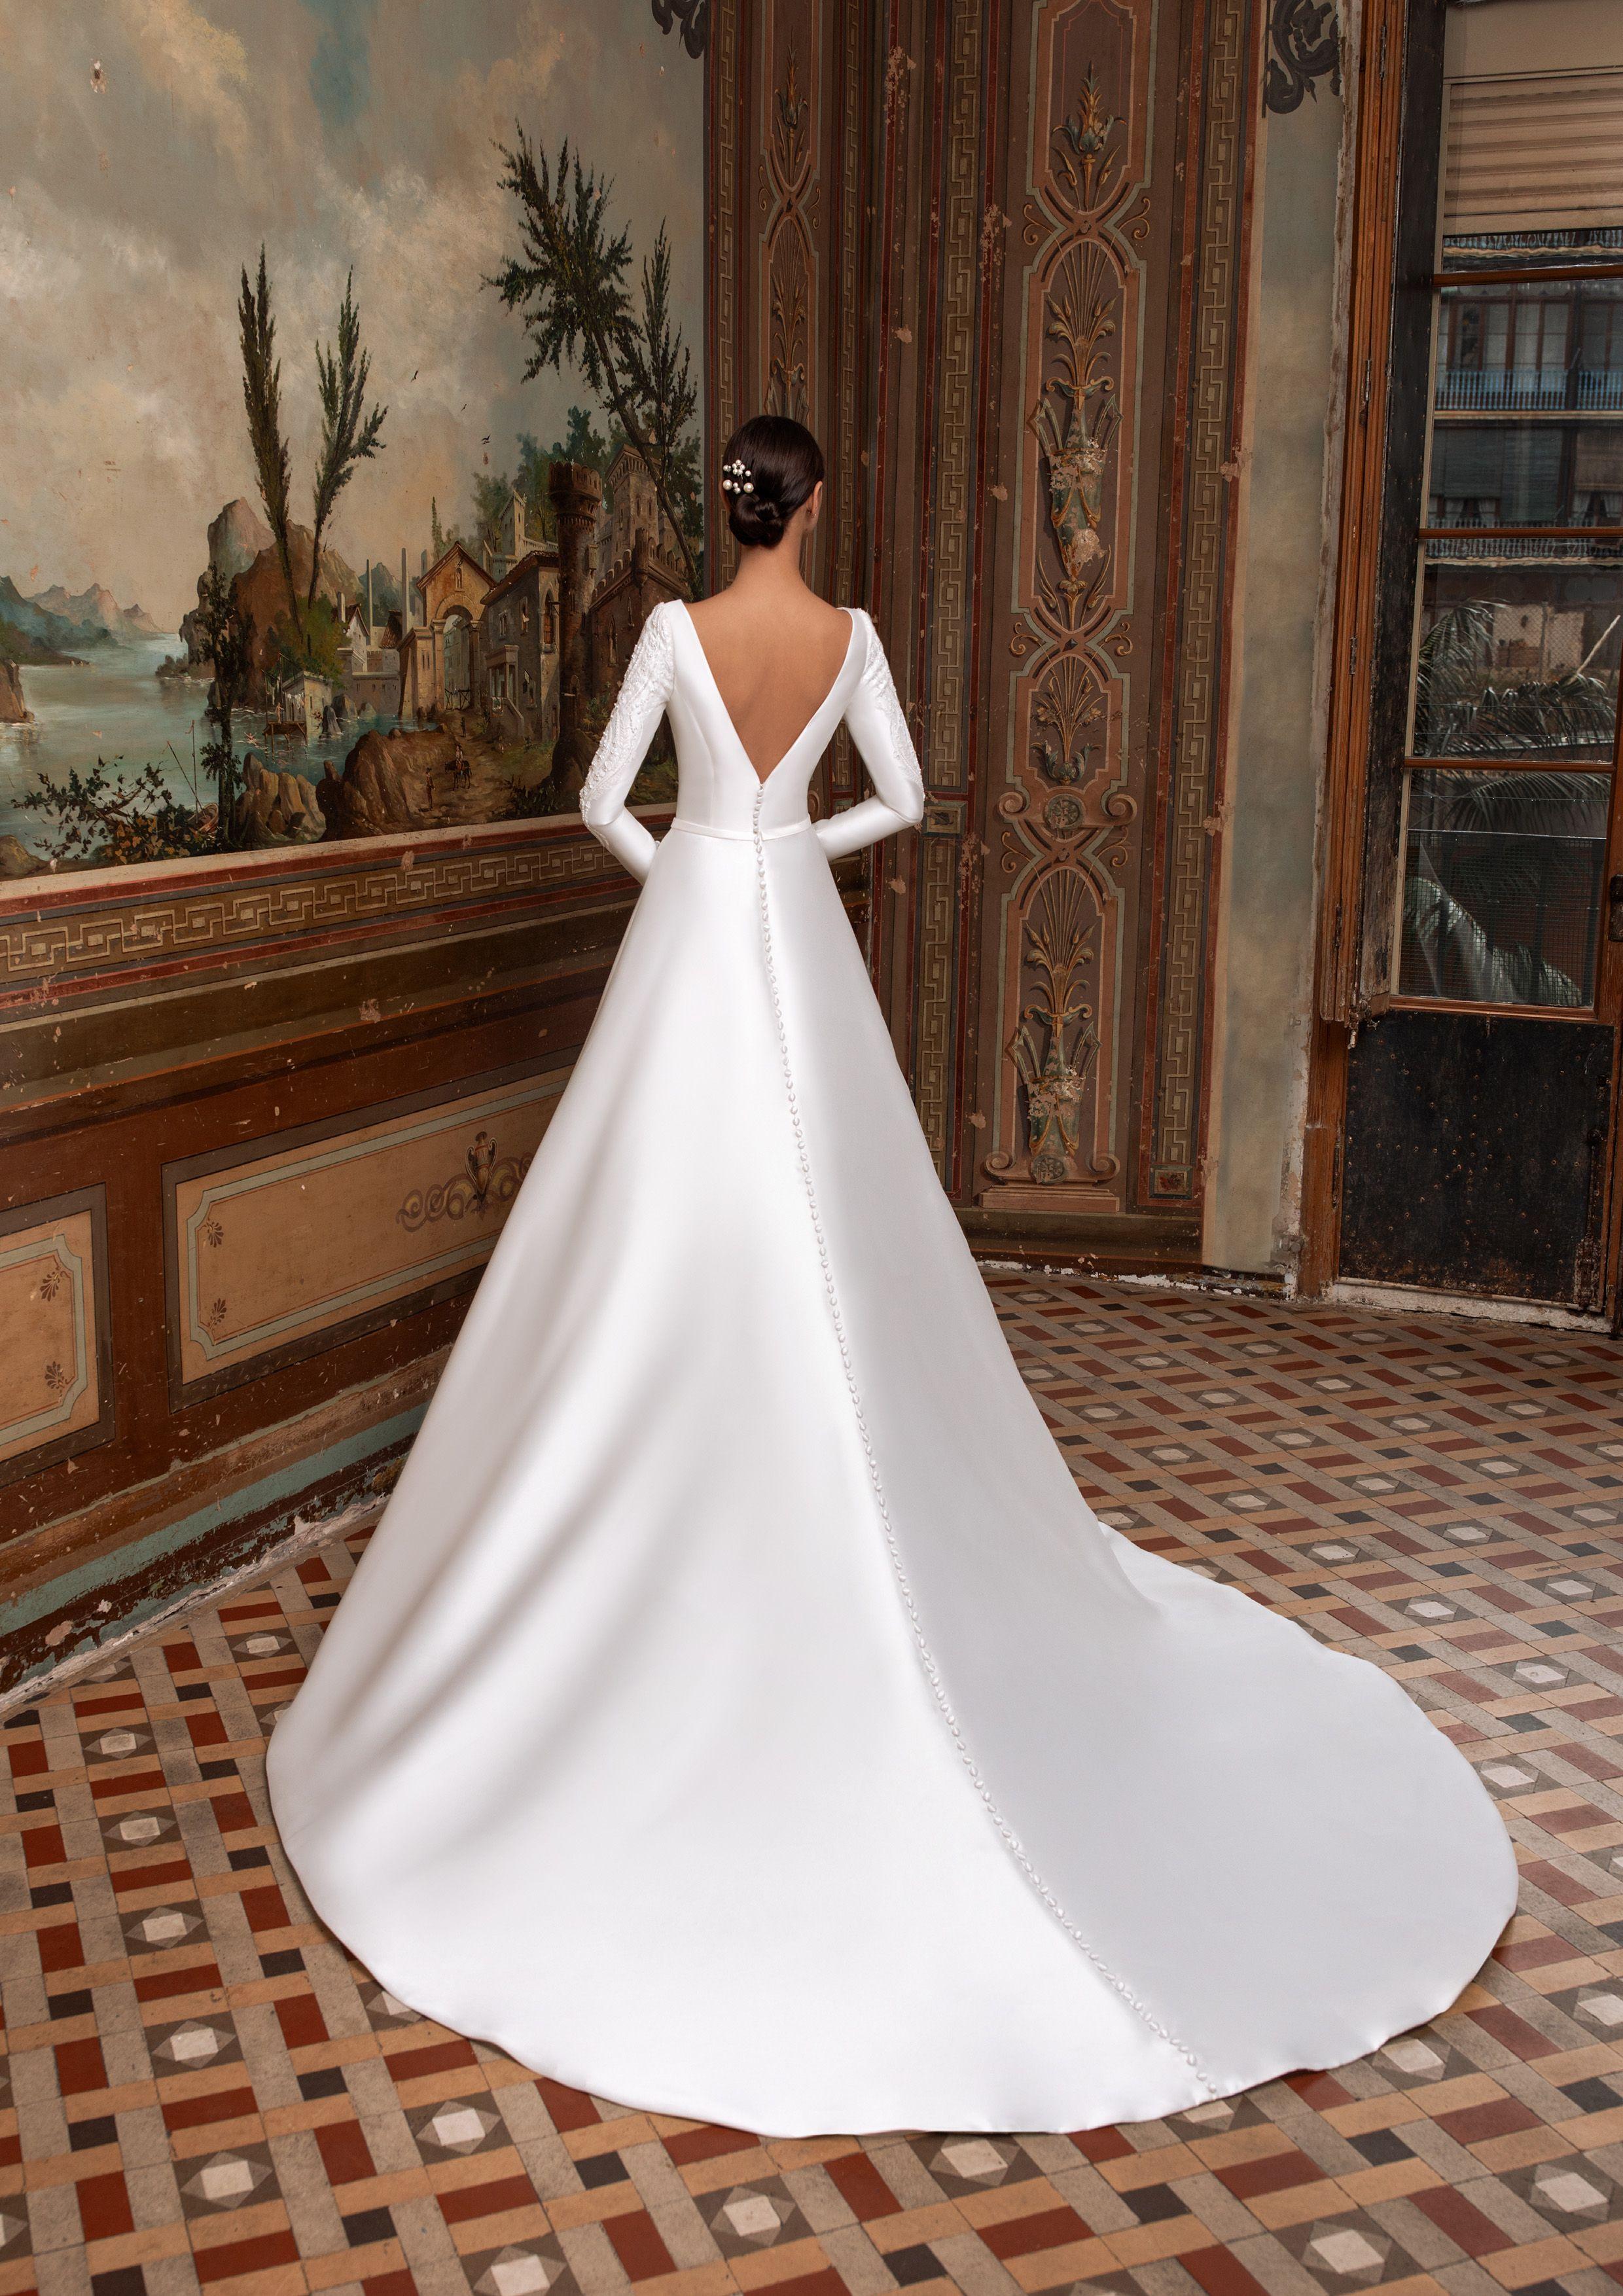 Royal Wedding Inspiration Wedding Dresses Elegant Wedding Dress Dream Wedding Dresses [ 3508 x 2480 Pixel ]